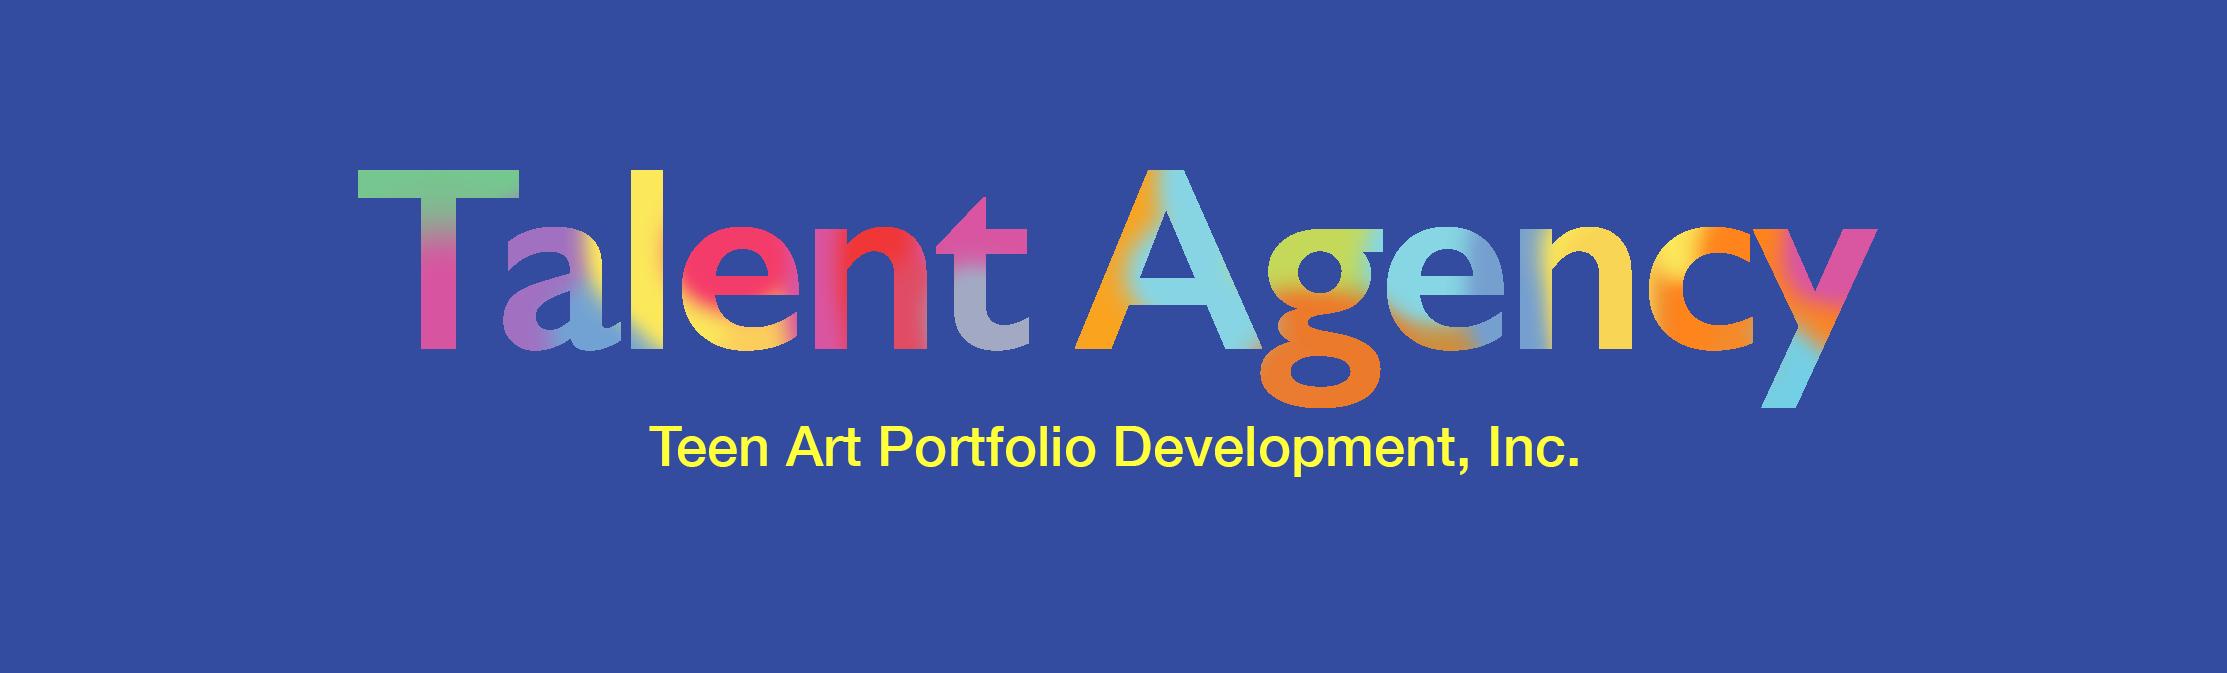 TalentAgencylogo3.png